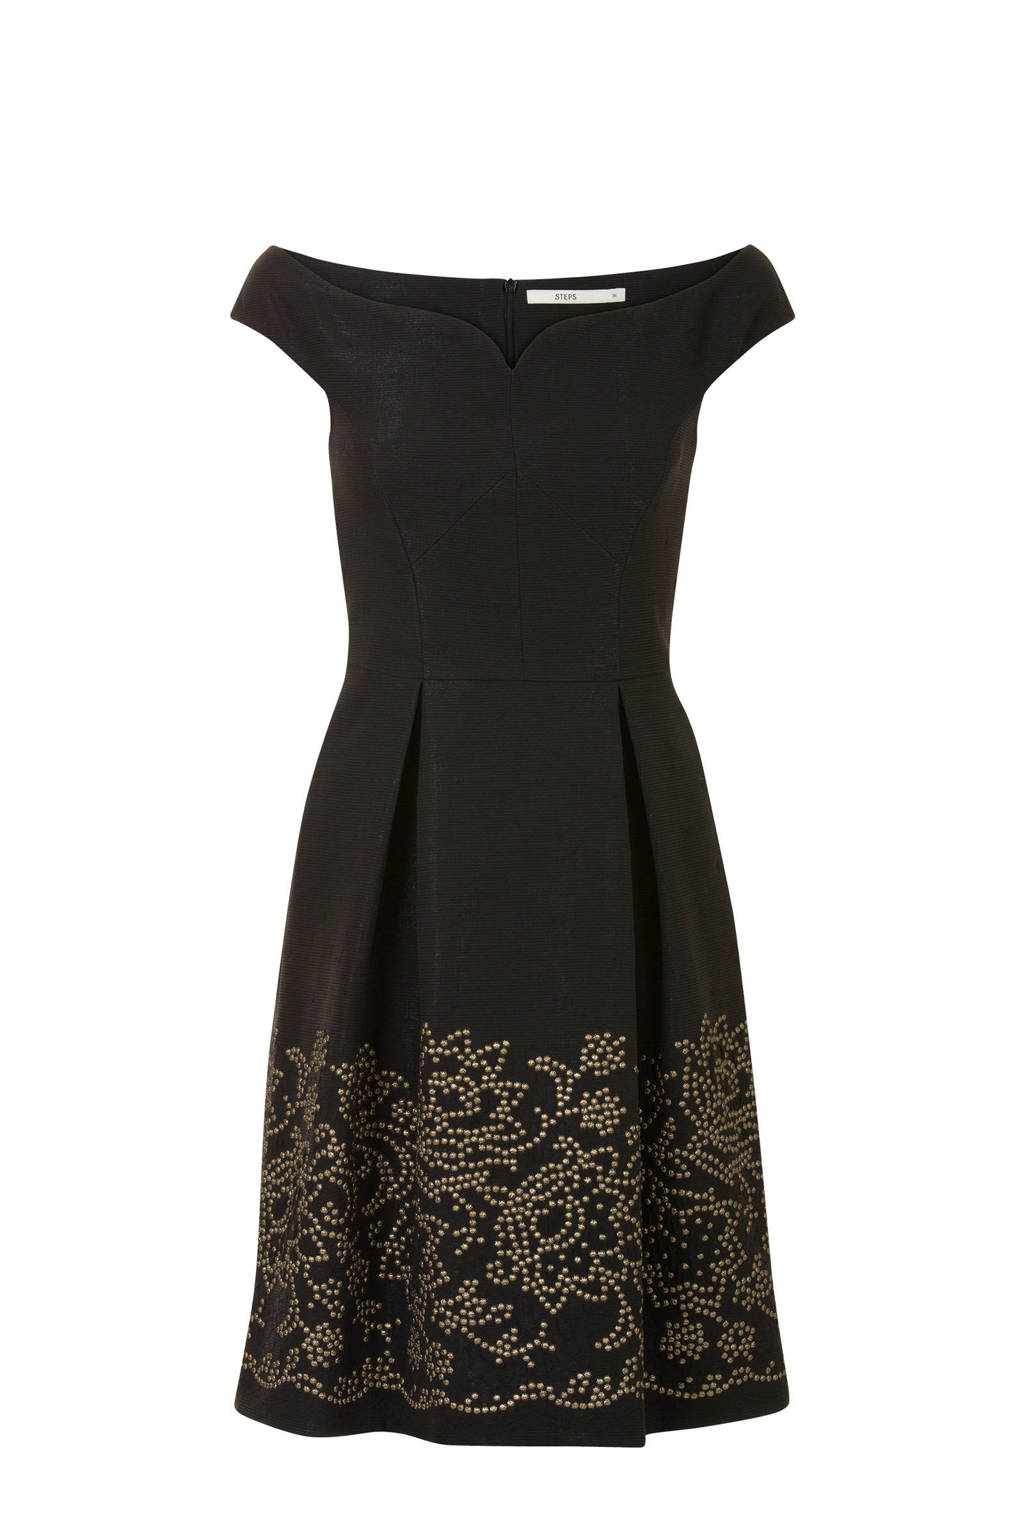 7994e129c5e2c3 Steps offshoulder jurk met gouden studs zwart